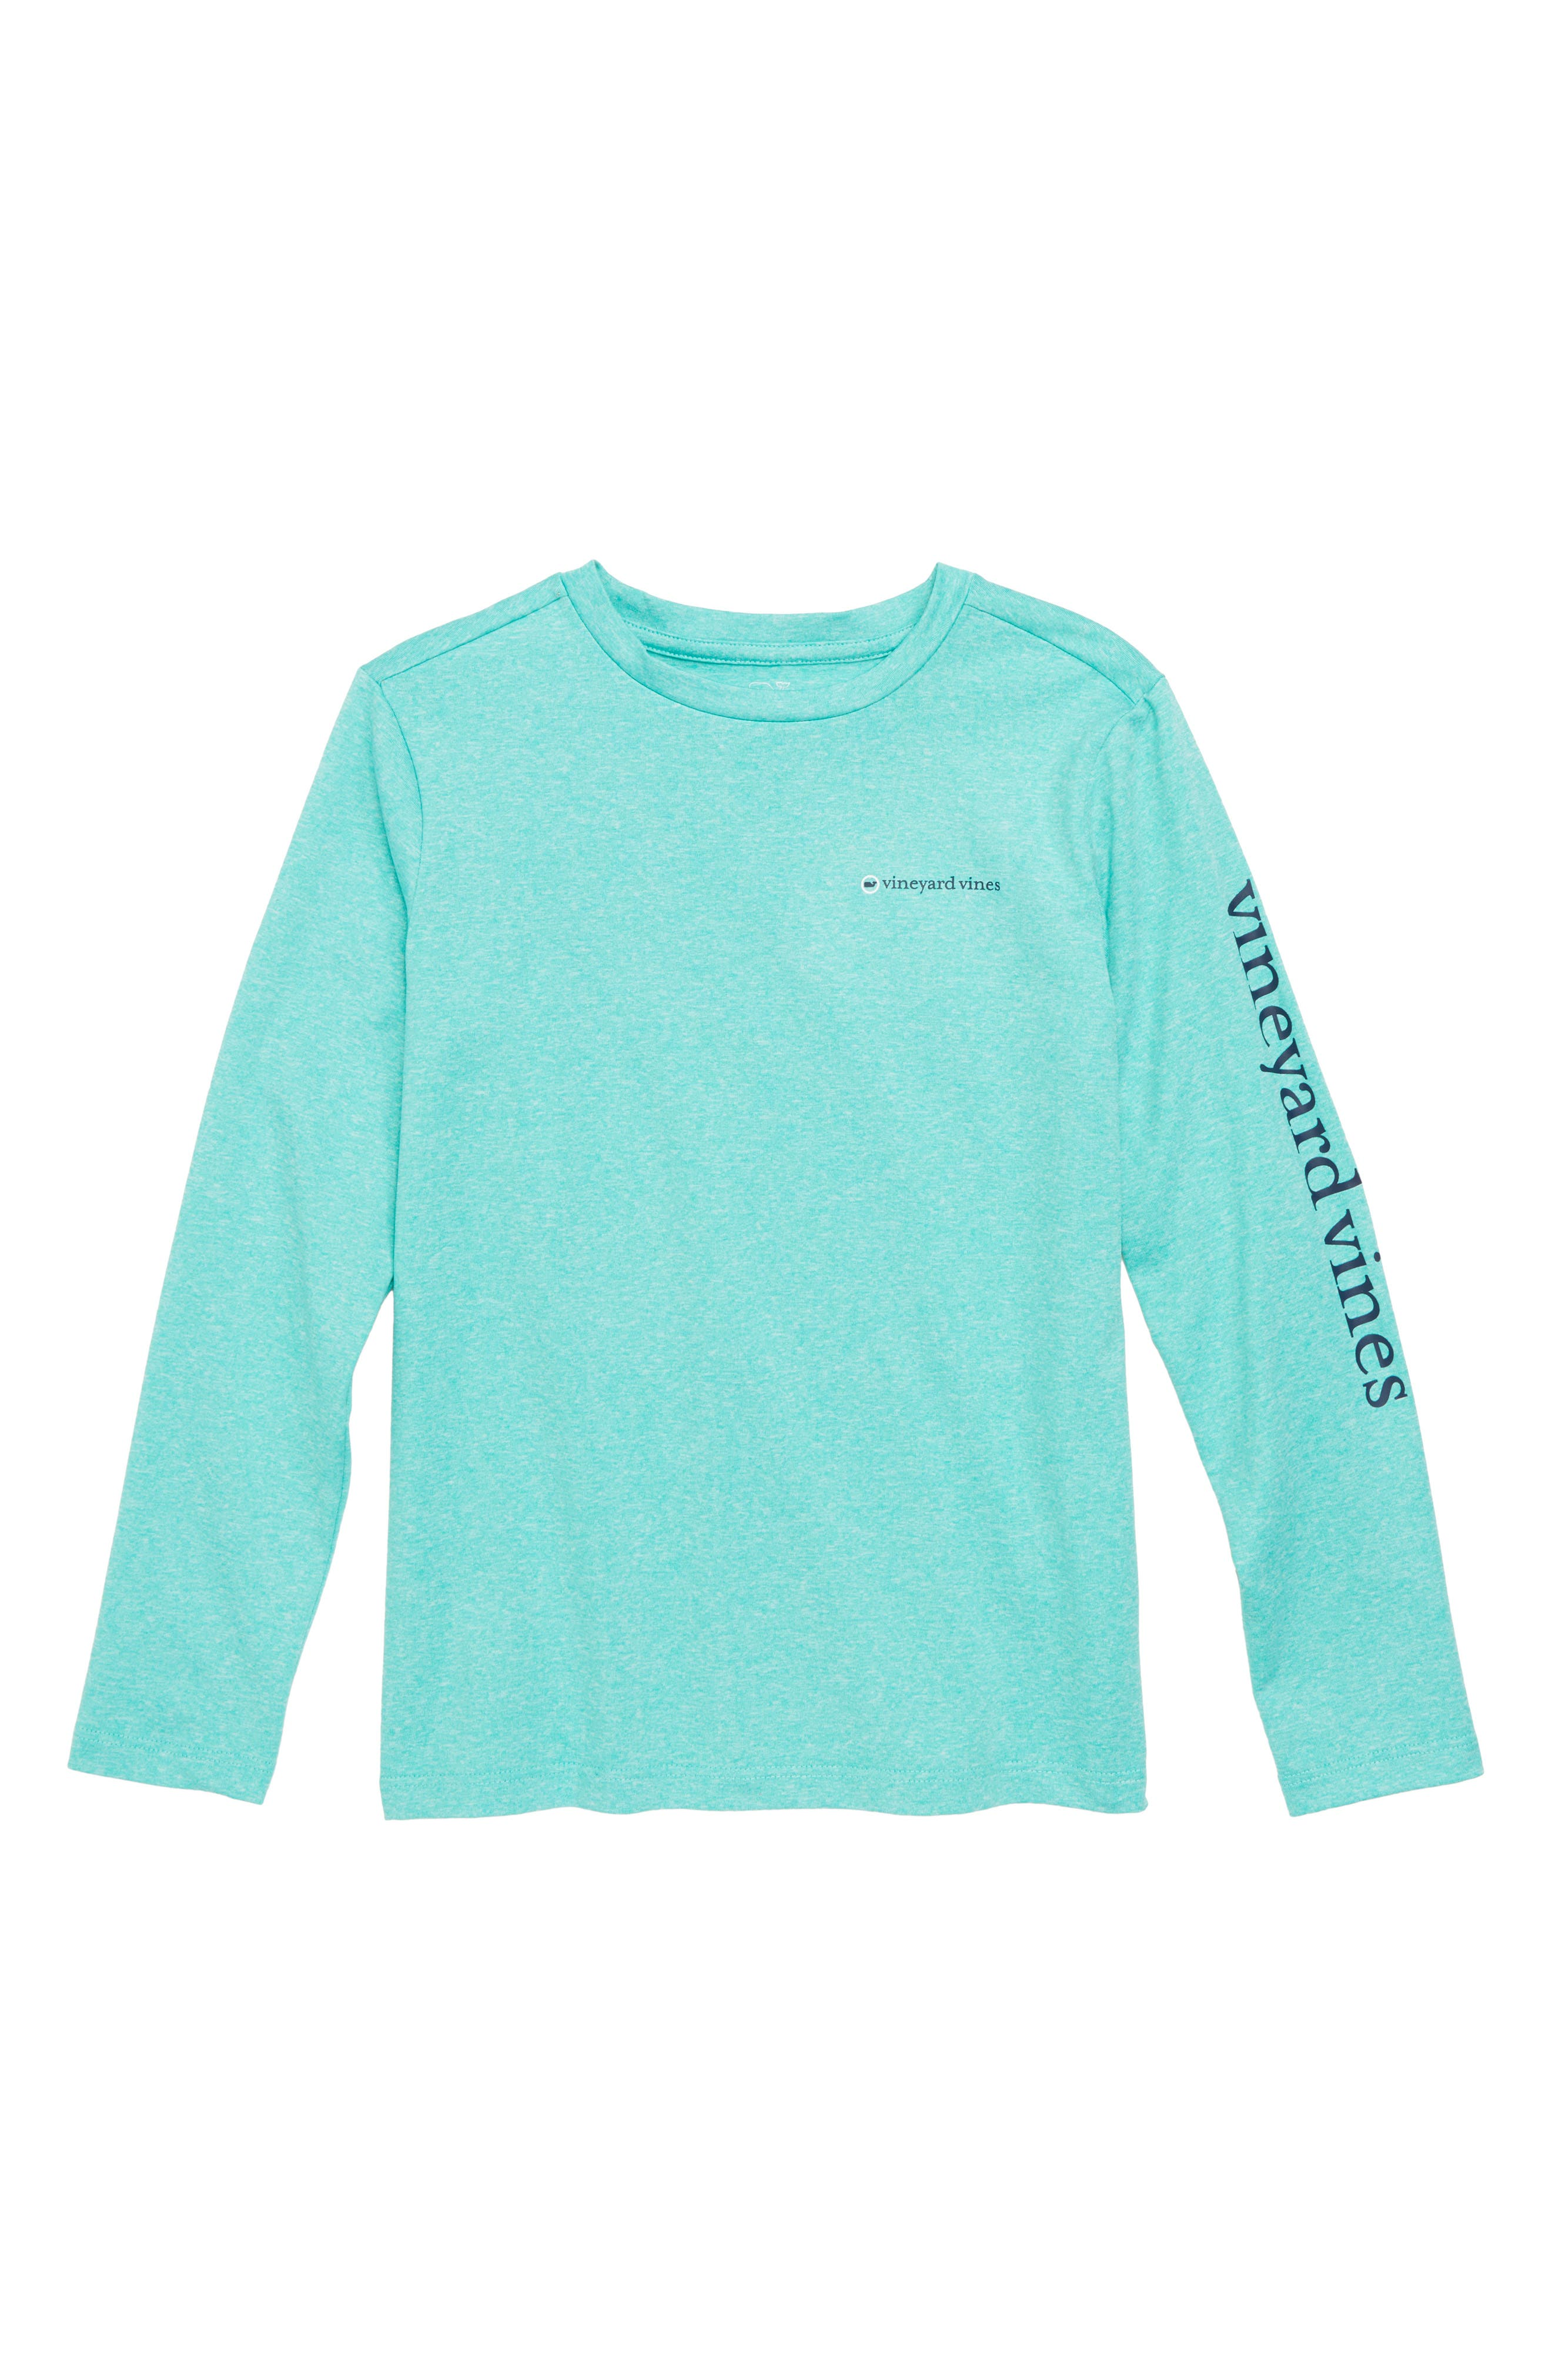 Performance Shirt,                         Main,                         color, 440